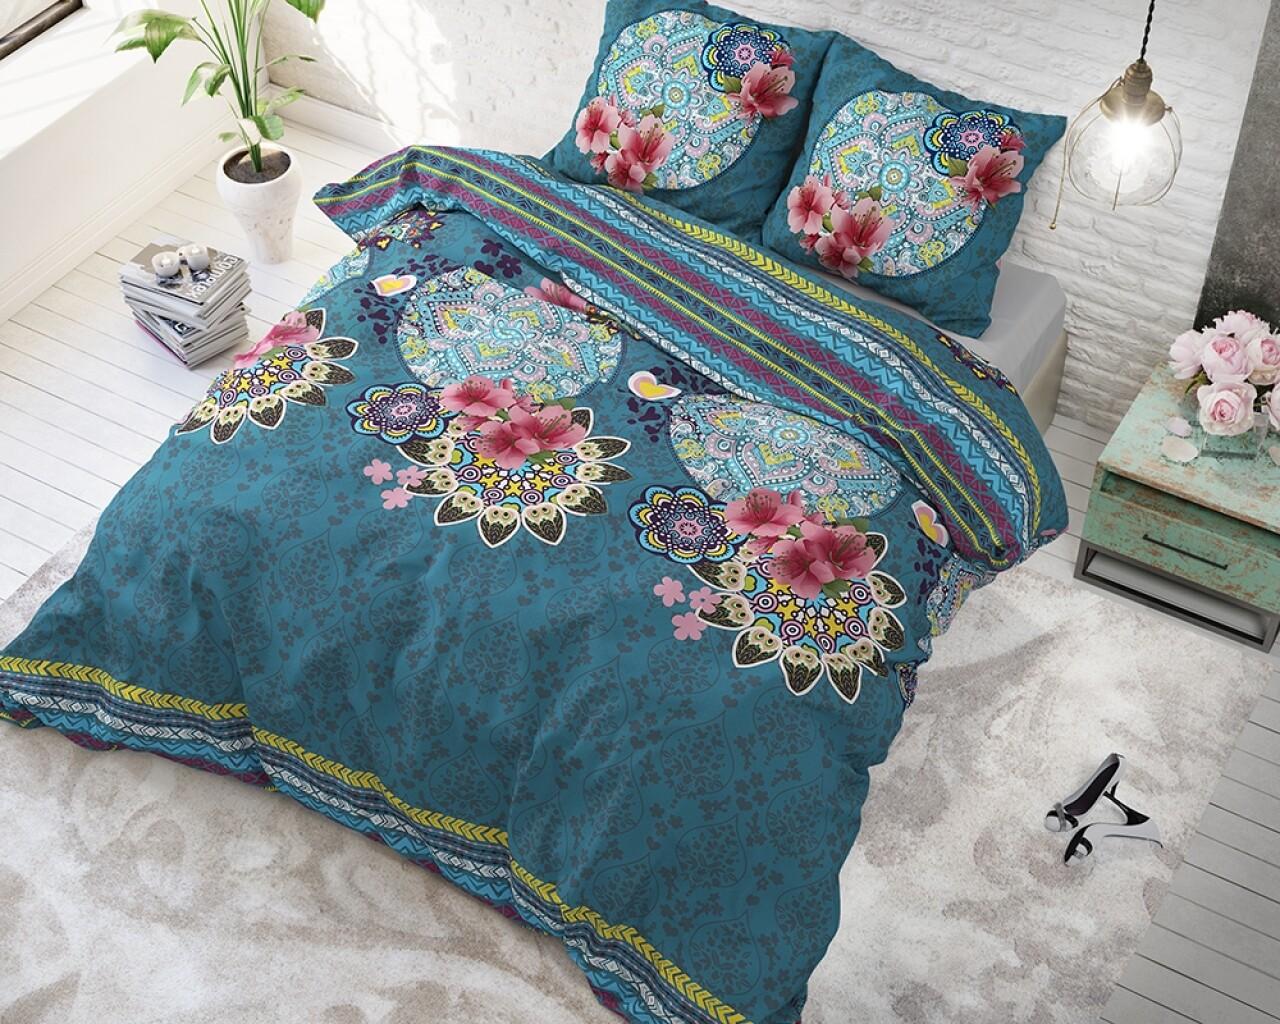 Lenjerie de pat pentru doua persoane Lana Turquoise, Sleeptime, Cotton Blended